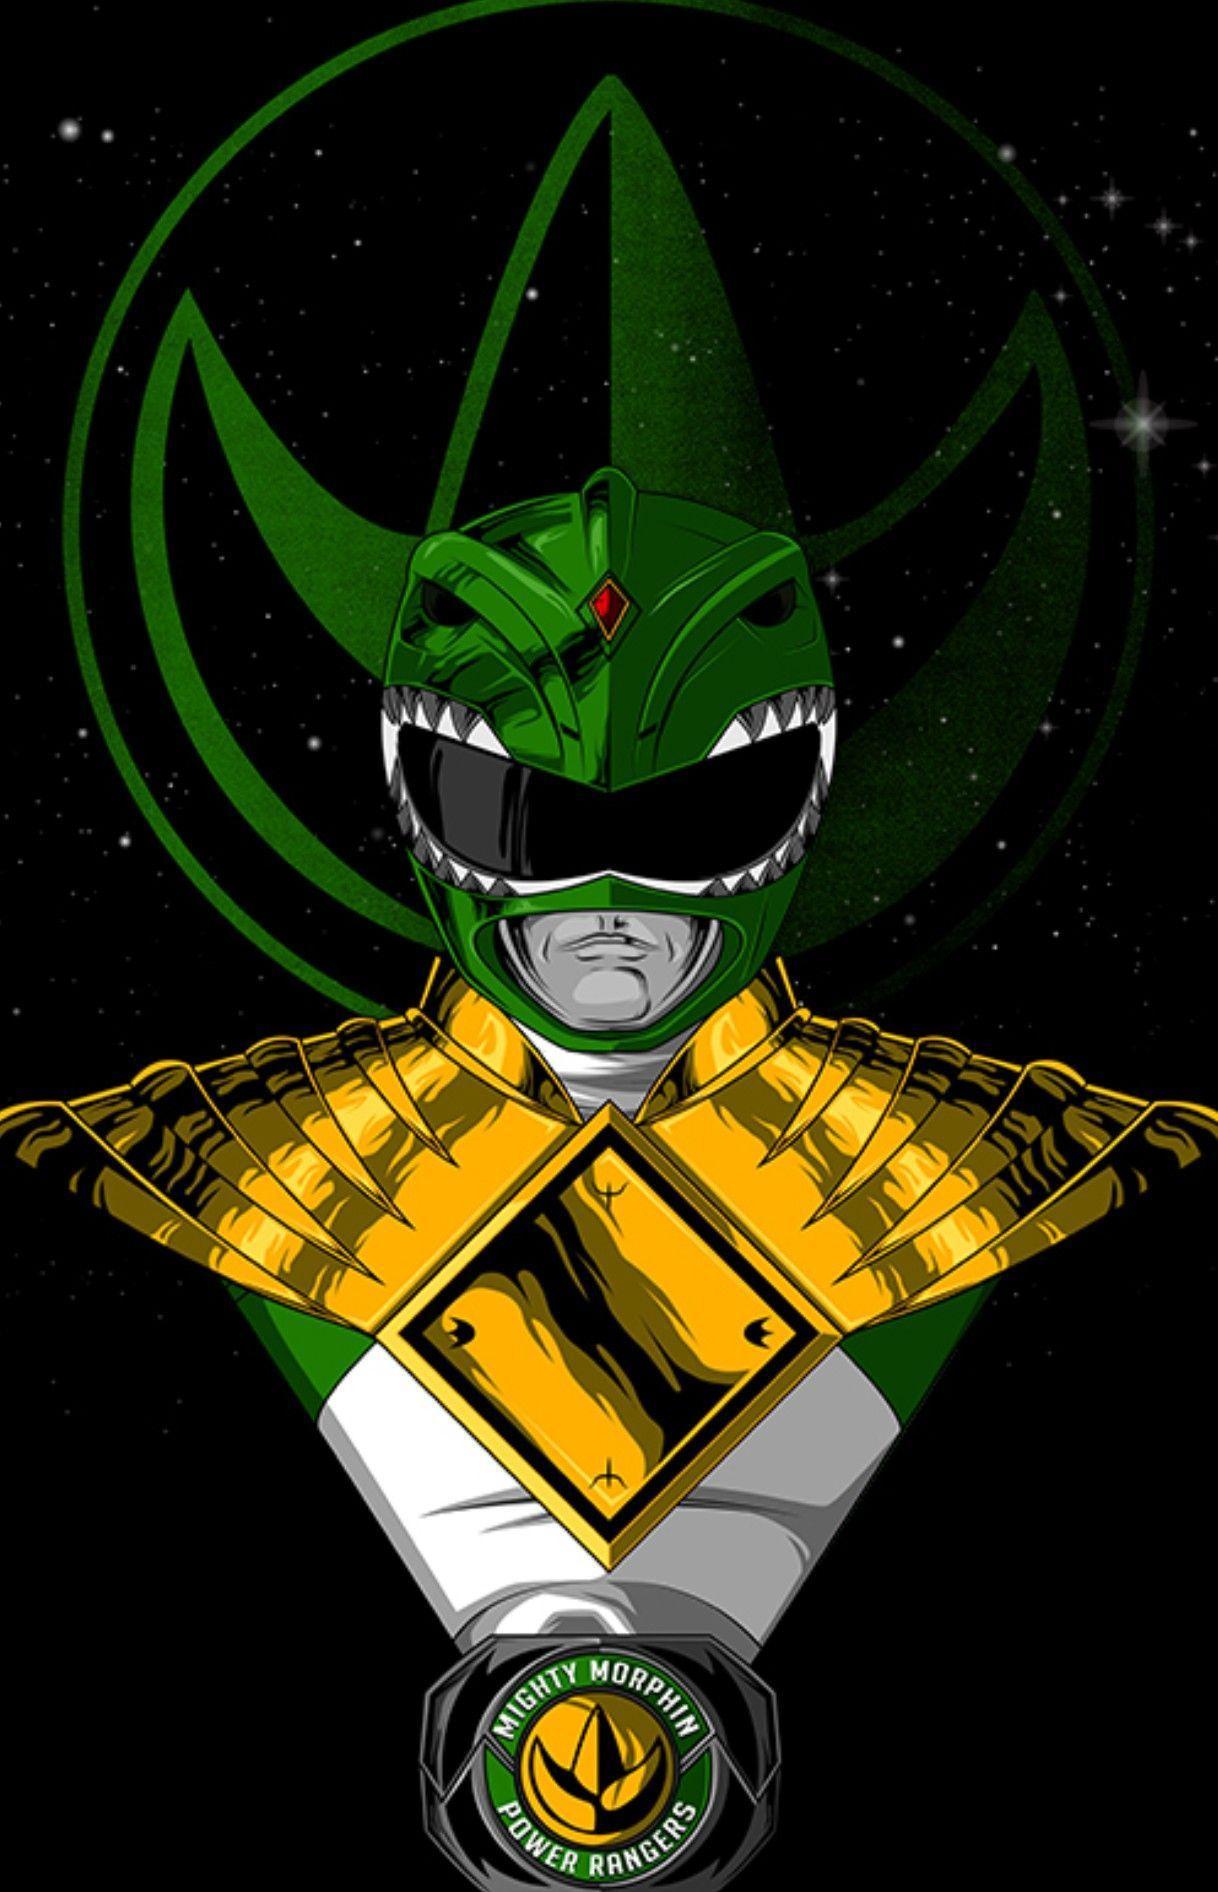 Green Ranger Wallpapers Top Free Green Ranger Backgrounds